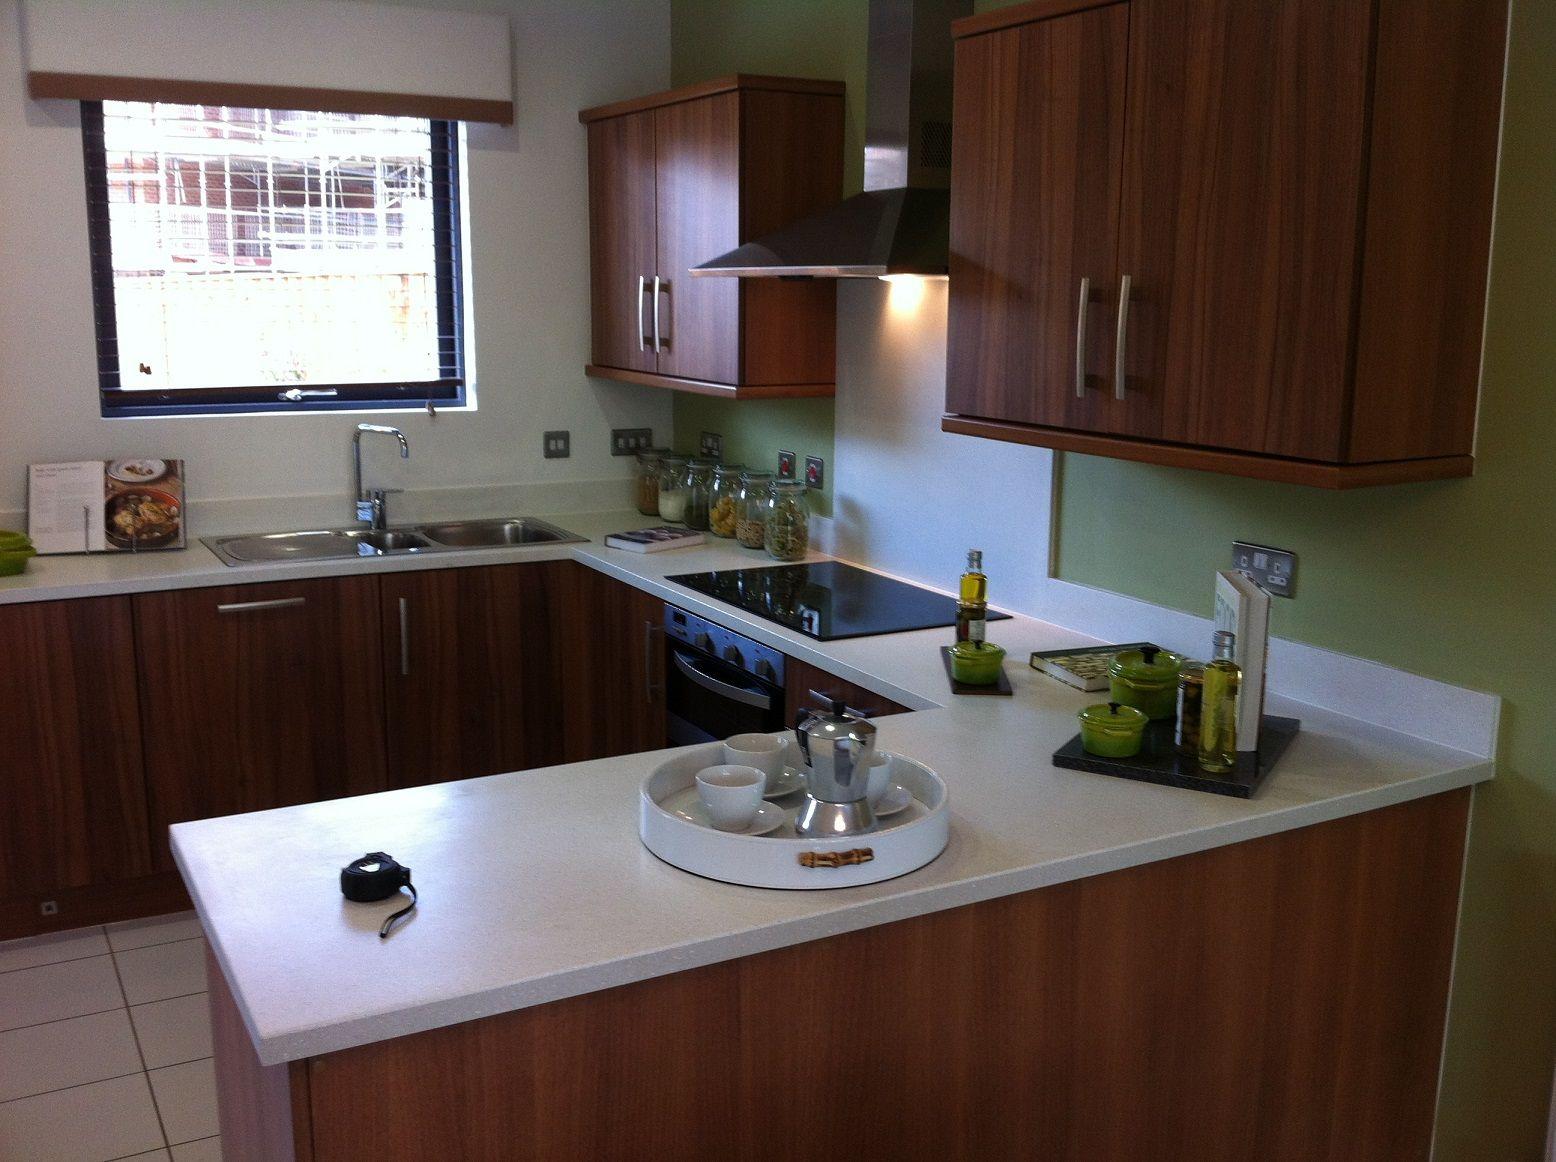 We supply Marble Worktops, Granite Worktops and Quartz